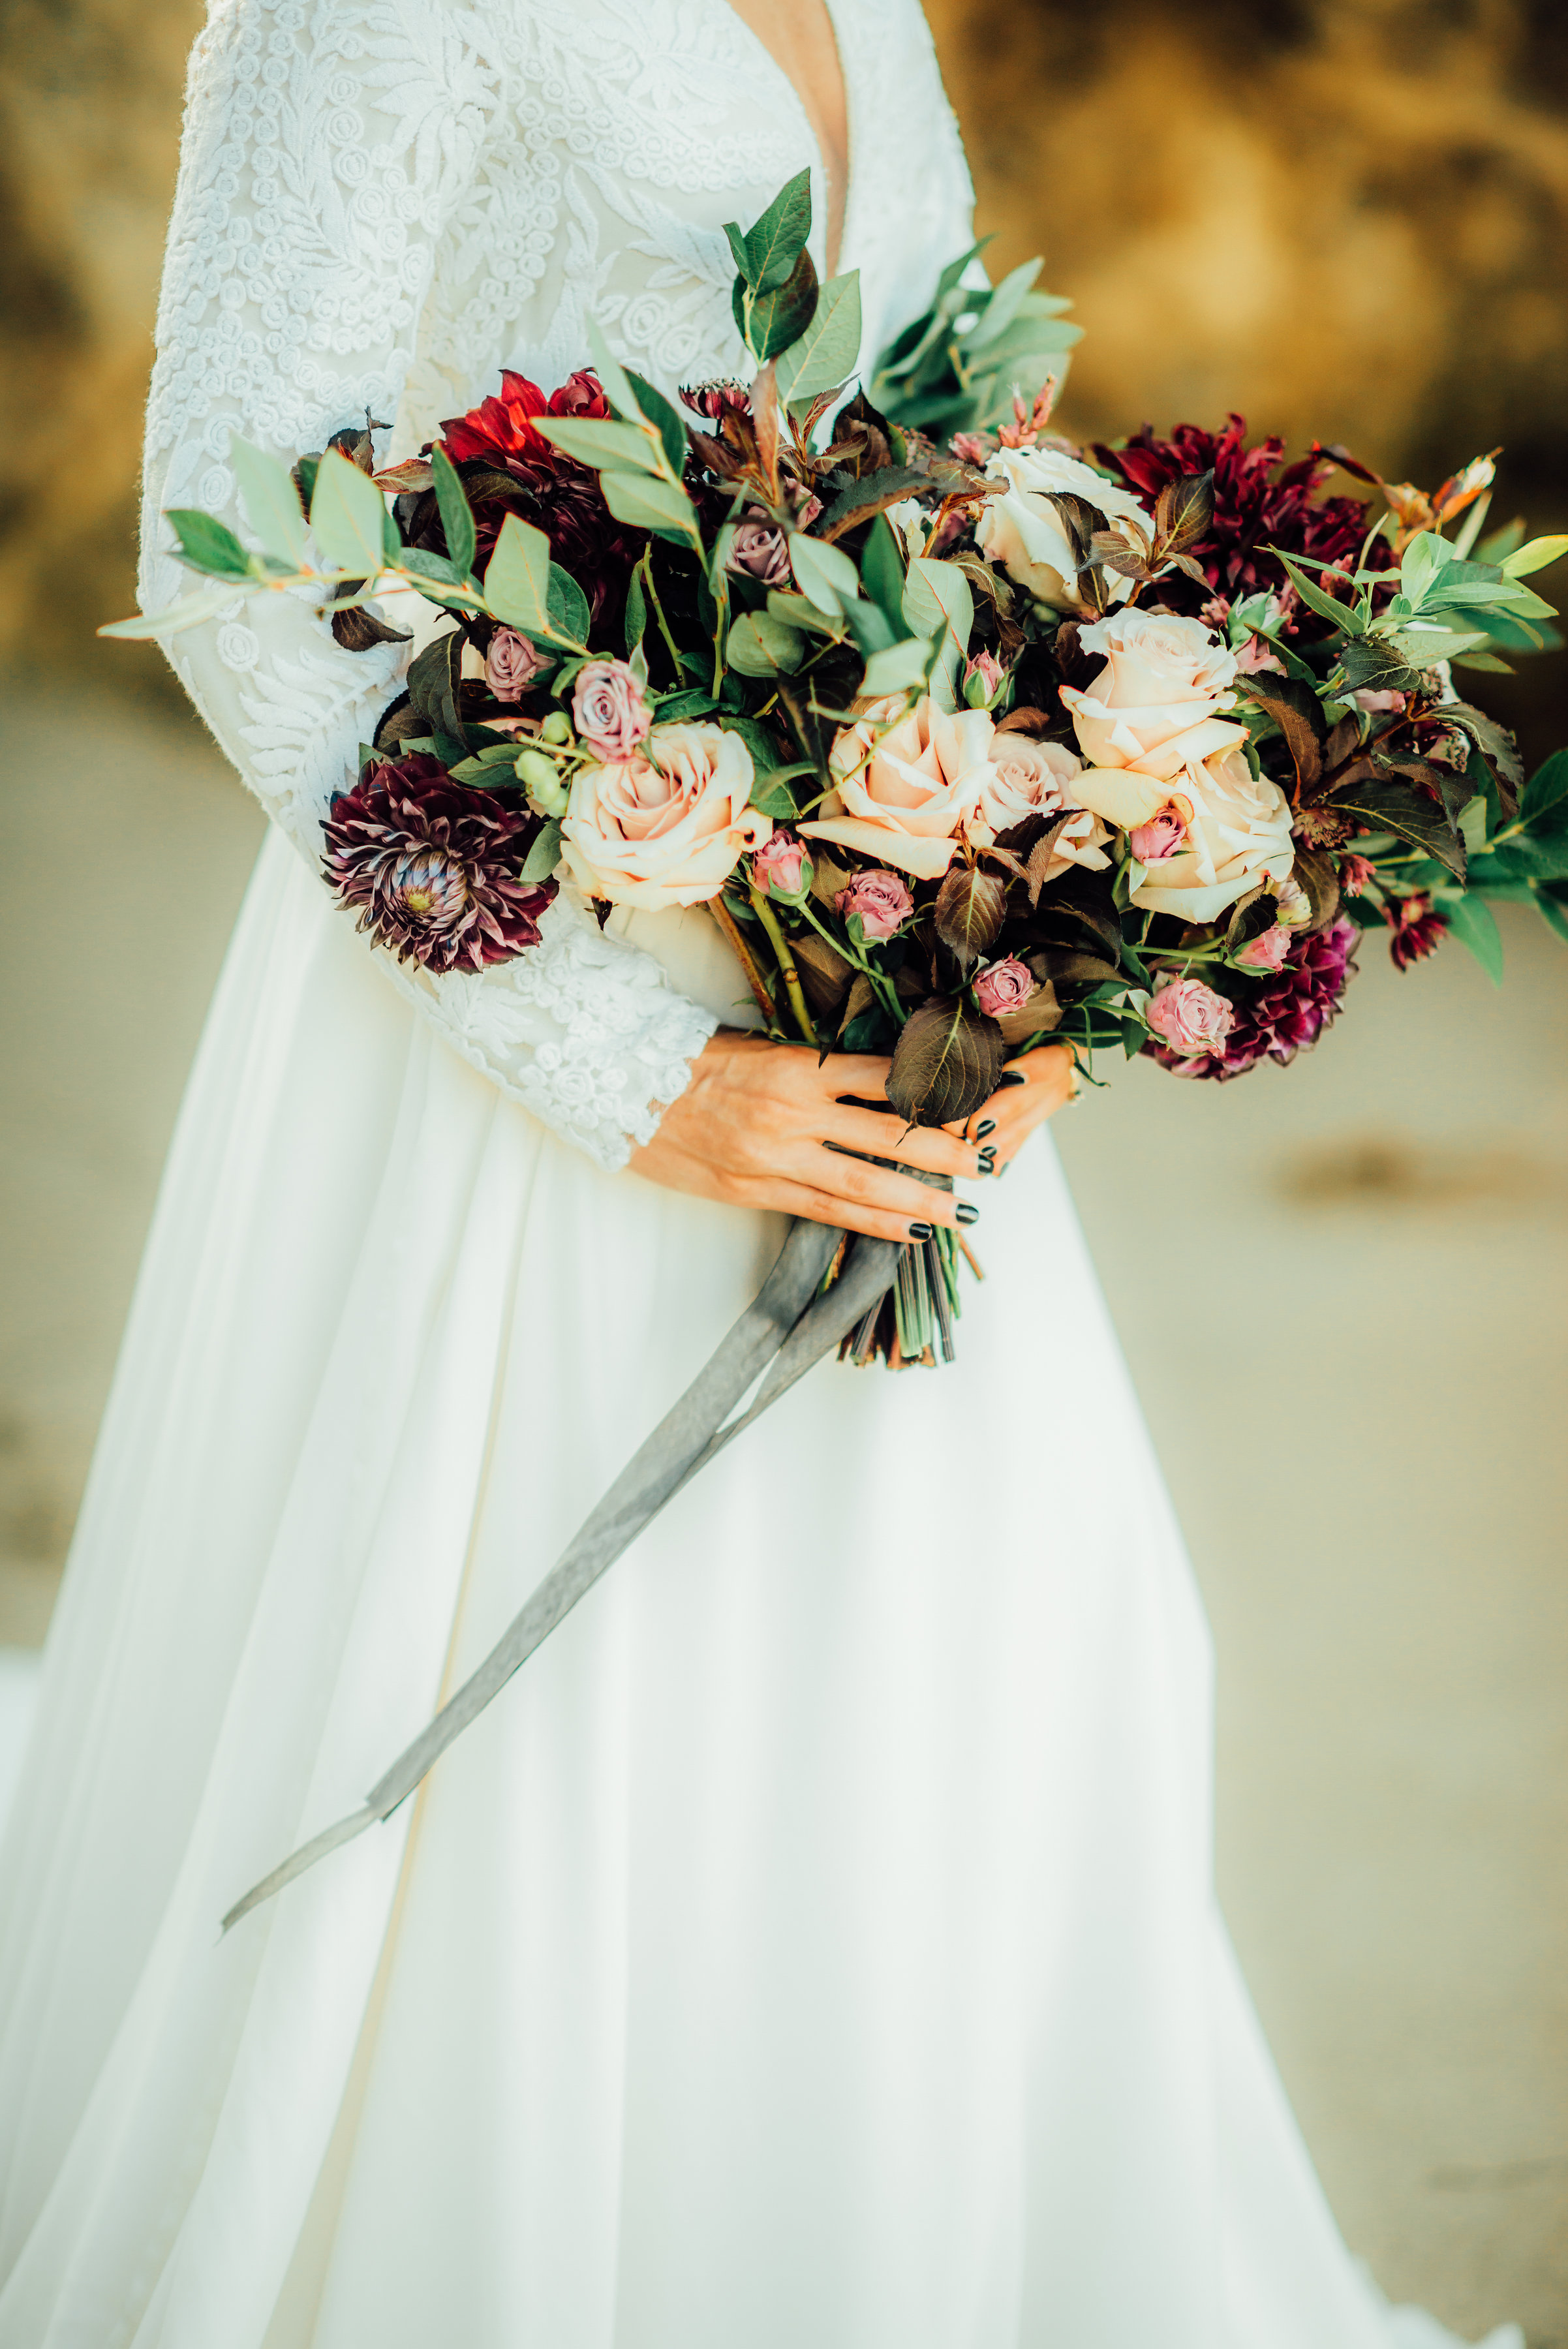 Elopement_Flowers_Sibyl_Sophia_Moody_Garden-Florals_Bouquet.jpg